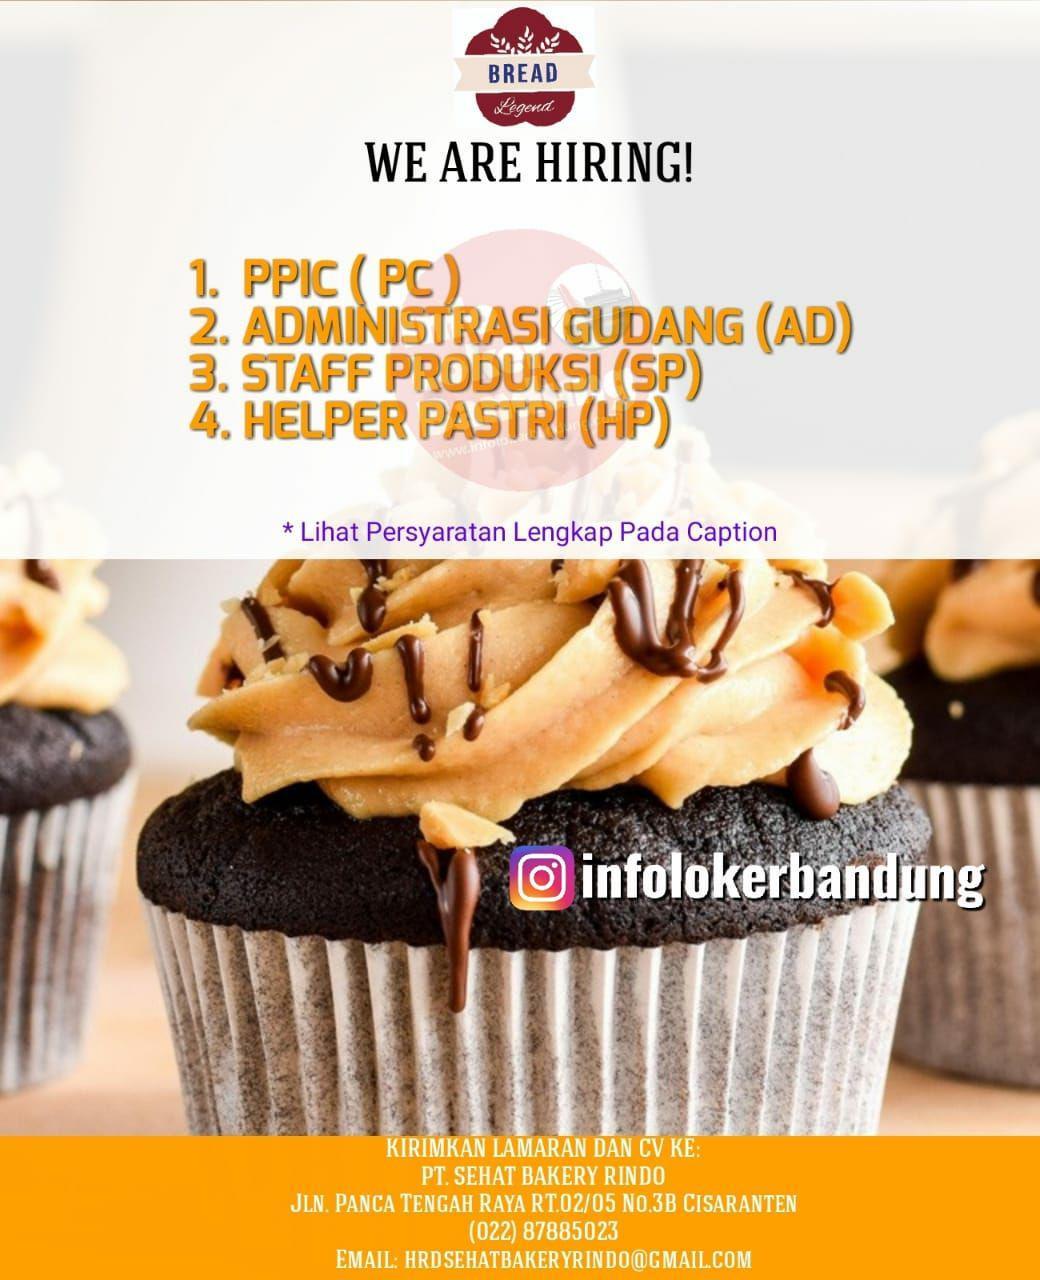 Lowongan Kerja PT. Sehat Bakery Rindo Bandung Juni 2019